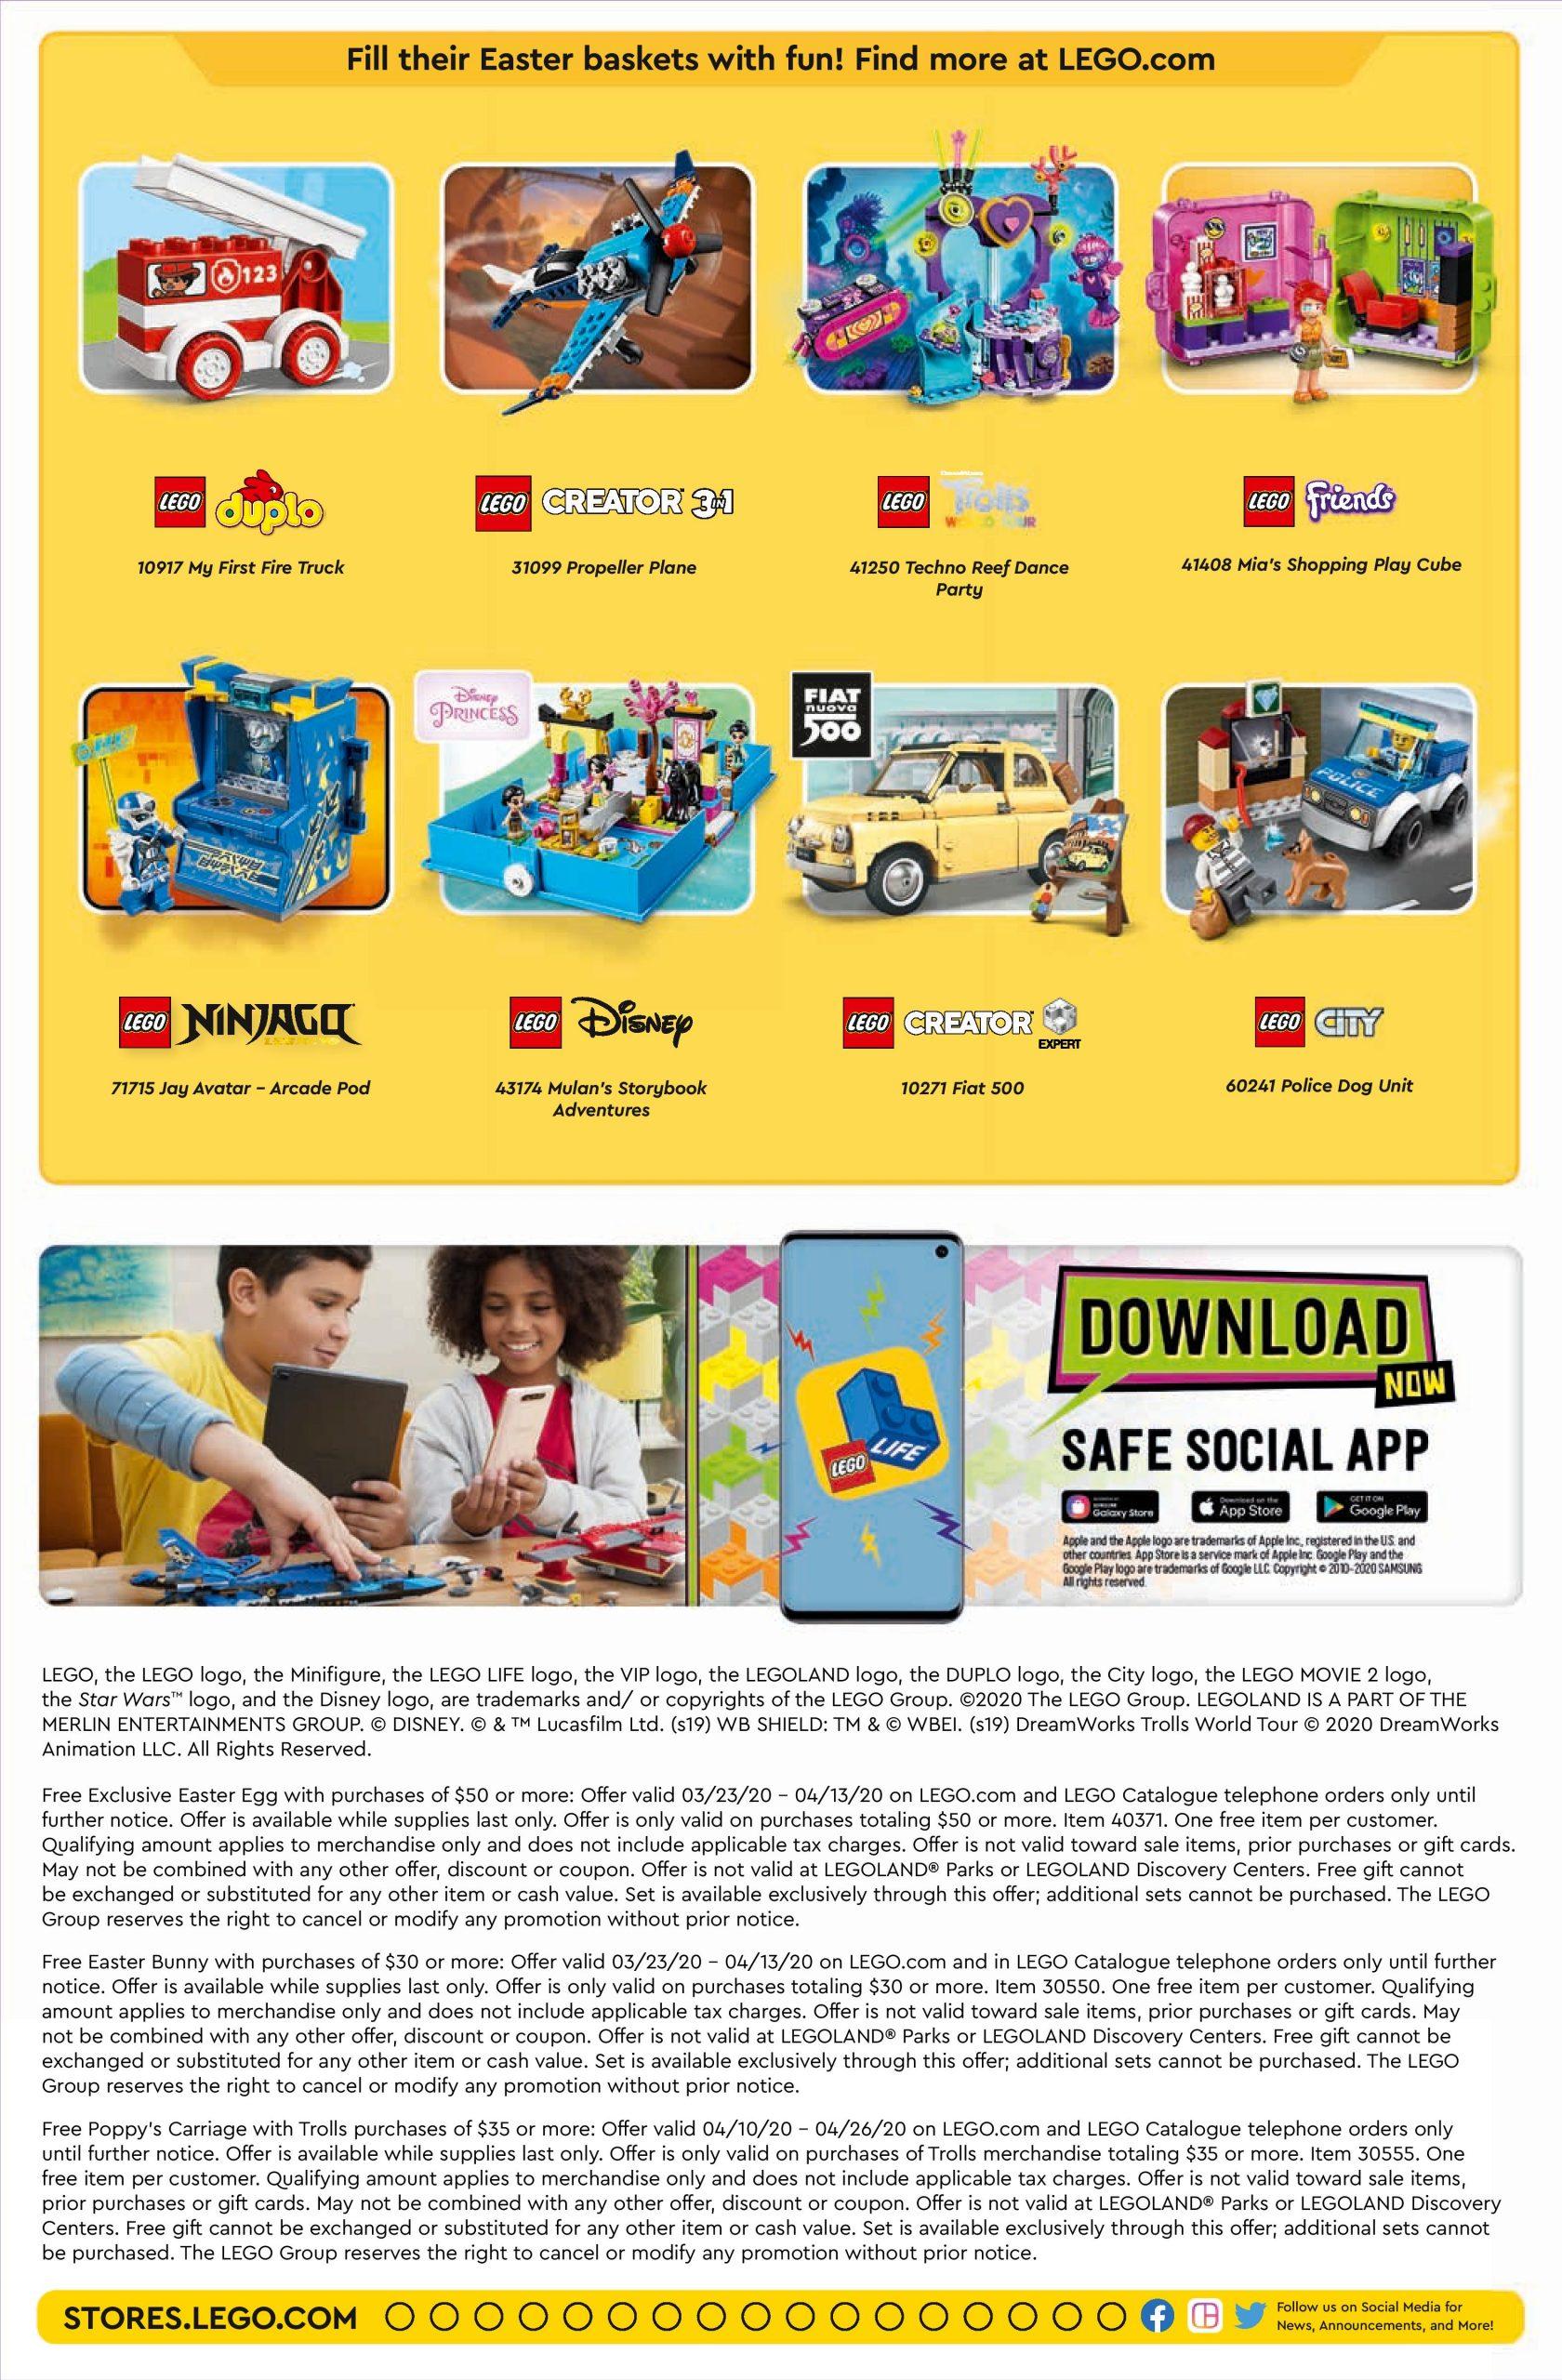 Lego April 2022 Calendar.Lego April 2020 Store Calendar Promotions Events The Brick Fan